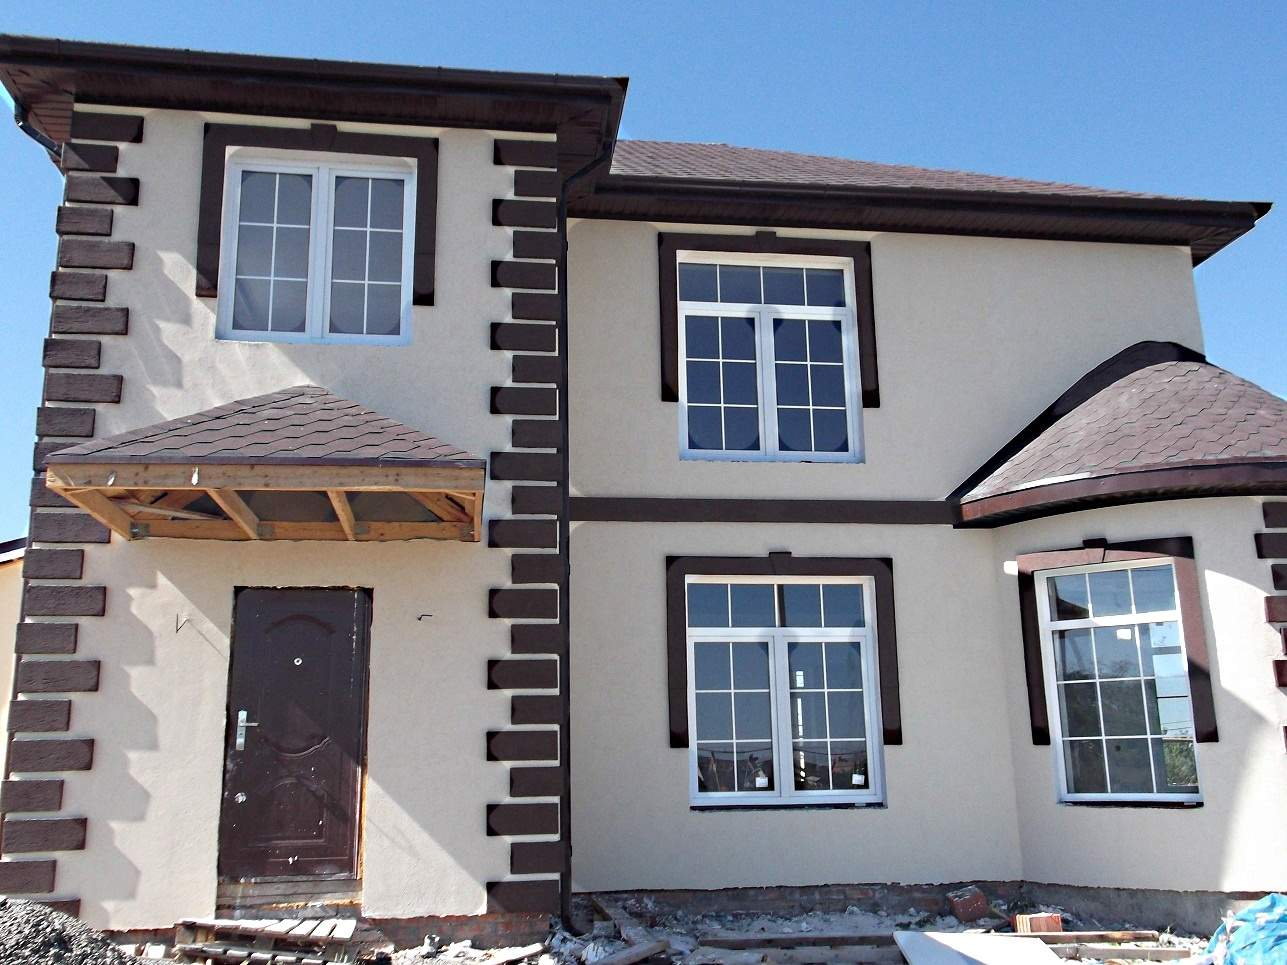 Заявление на ремонт фасада дома